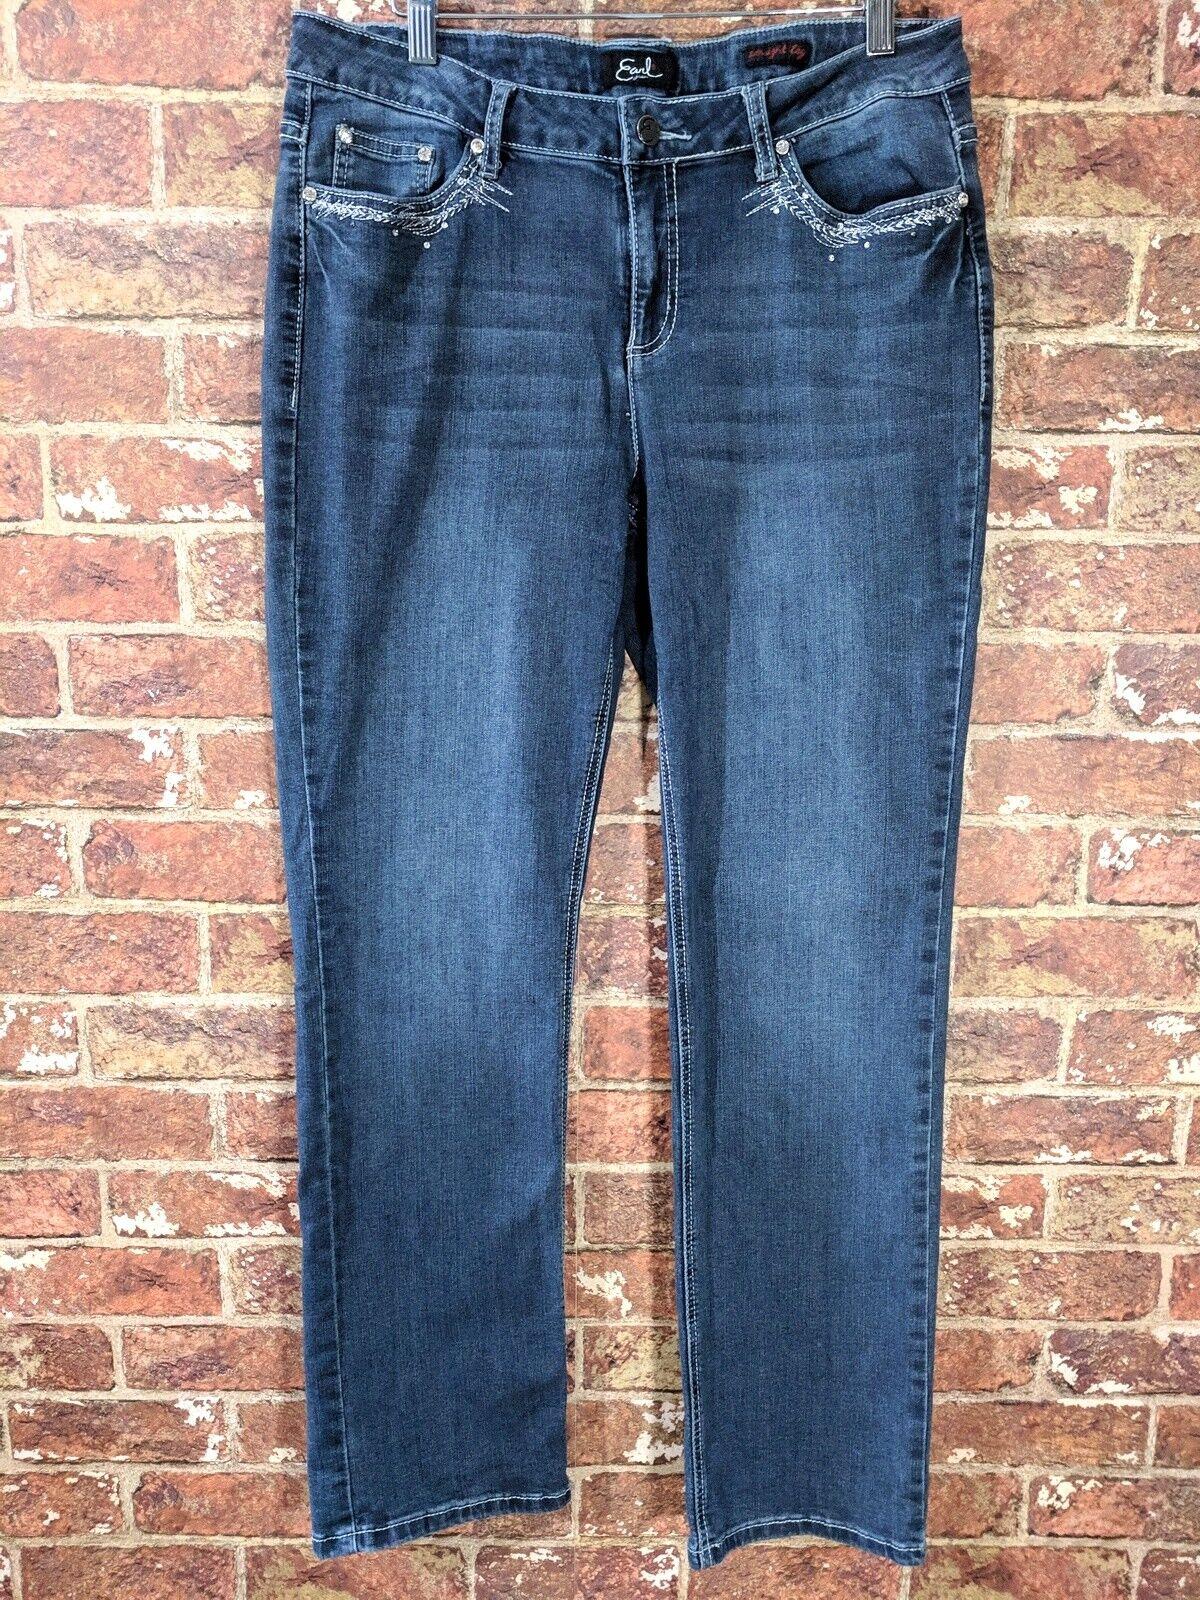 Earl Jeans 14 Jeans Stretch Denim Embellished Straight Leg